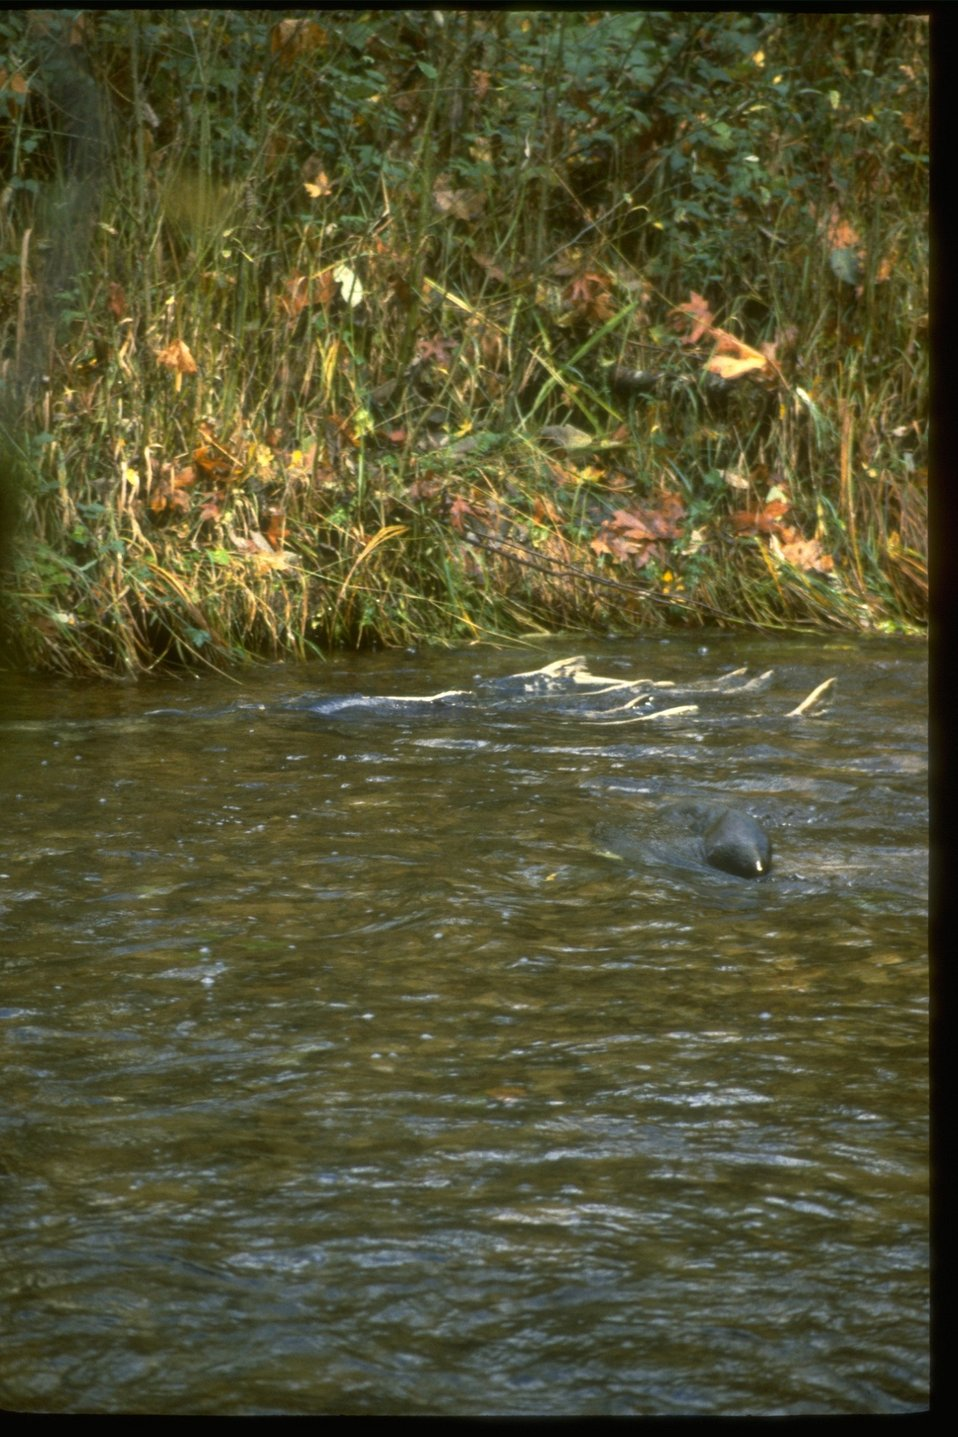 Chinnock Salmon swimming through Whitaker Creek